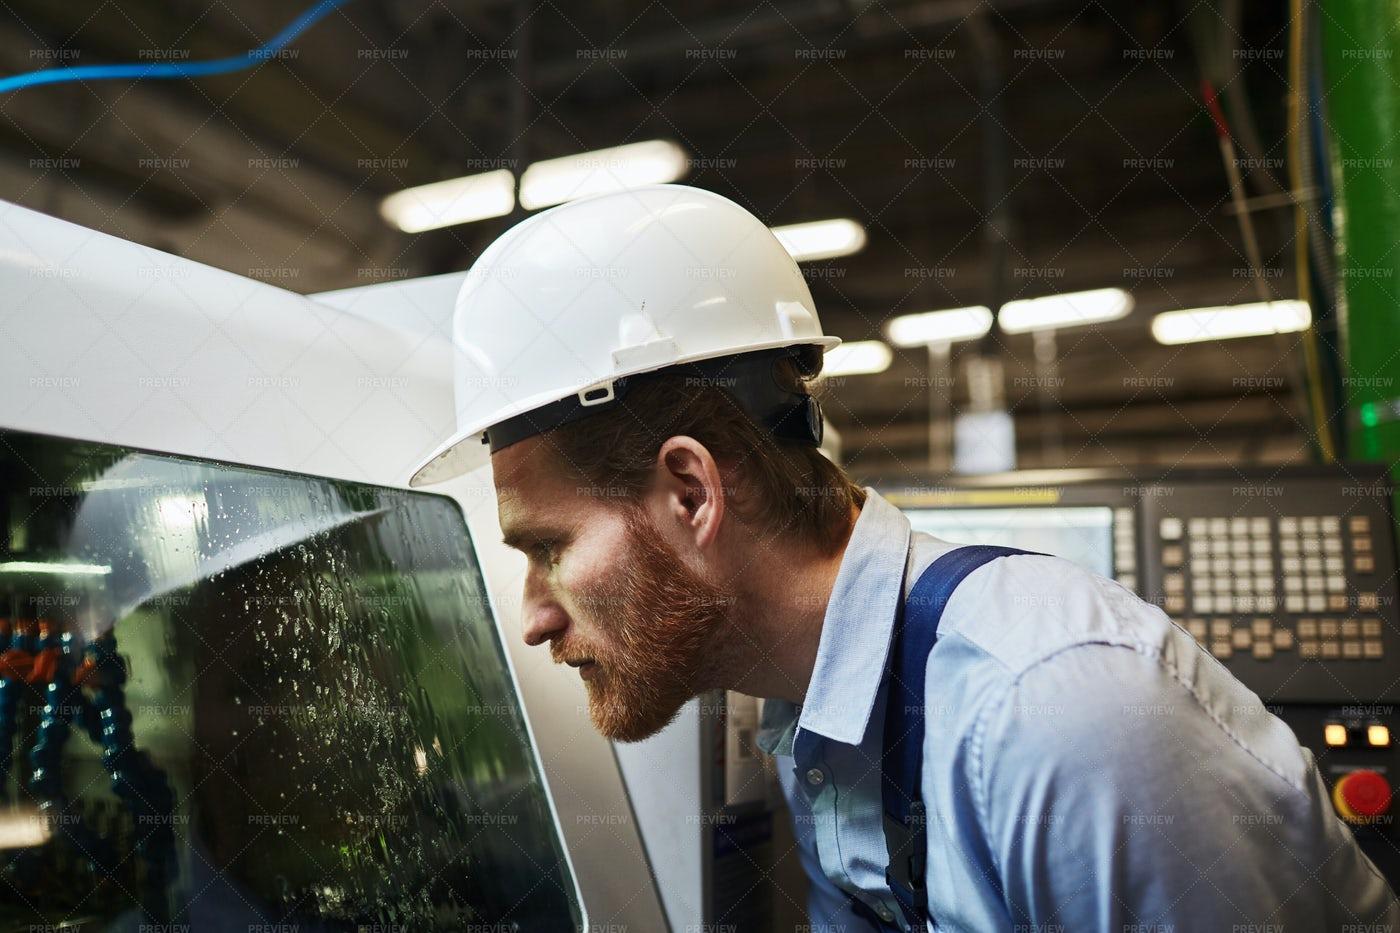 Watching CNC Machine Cleaning: Stock Photos